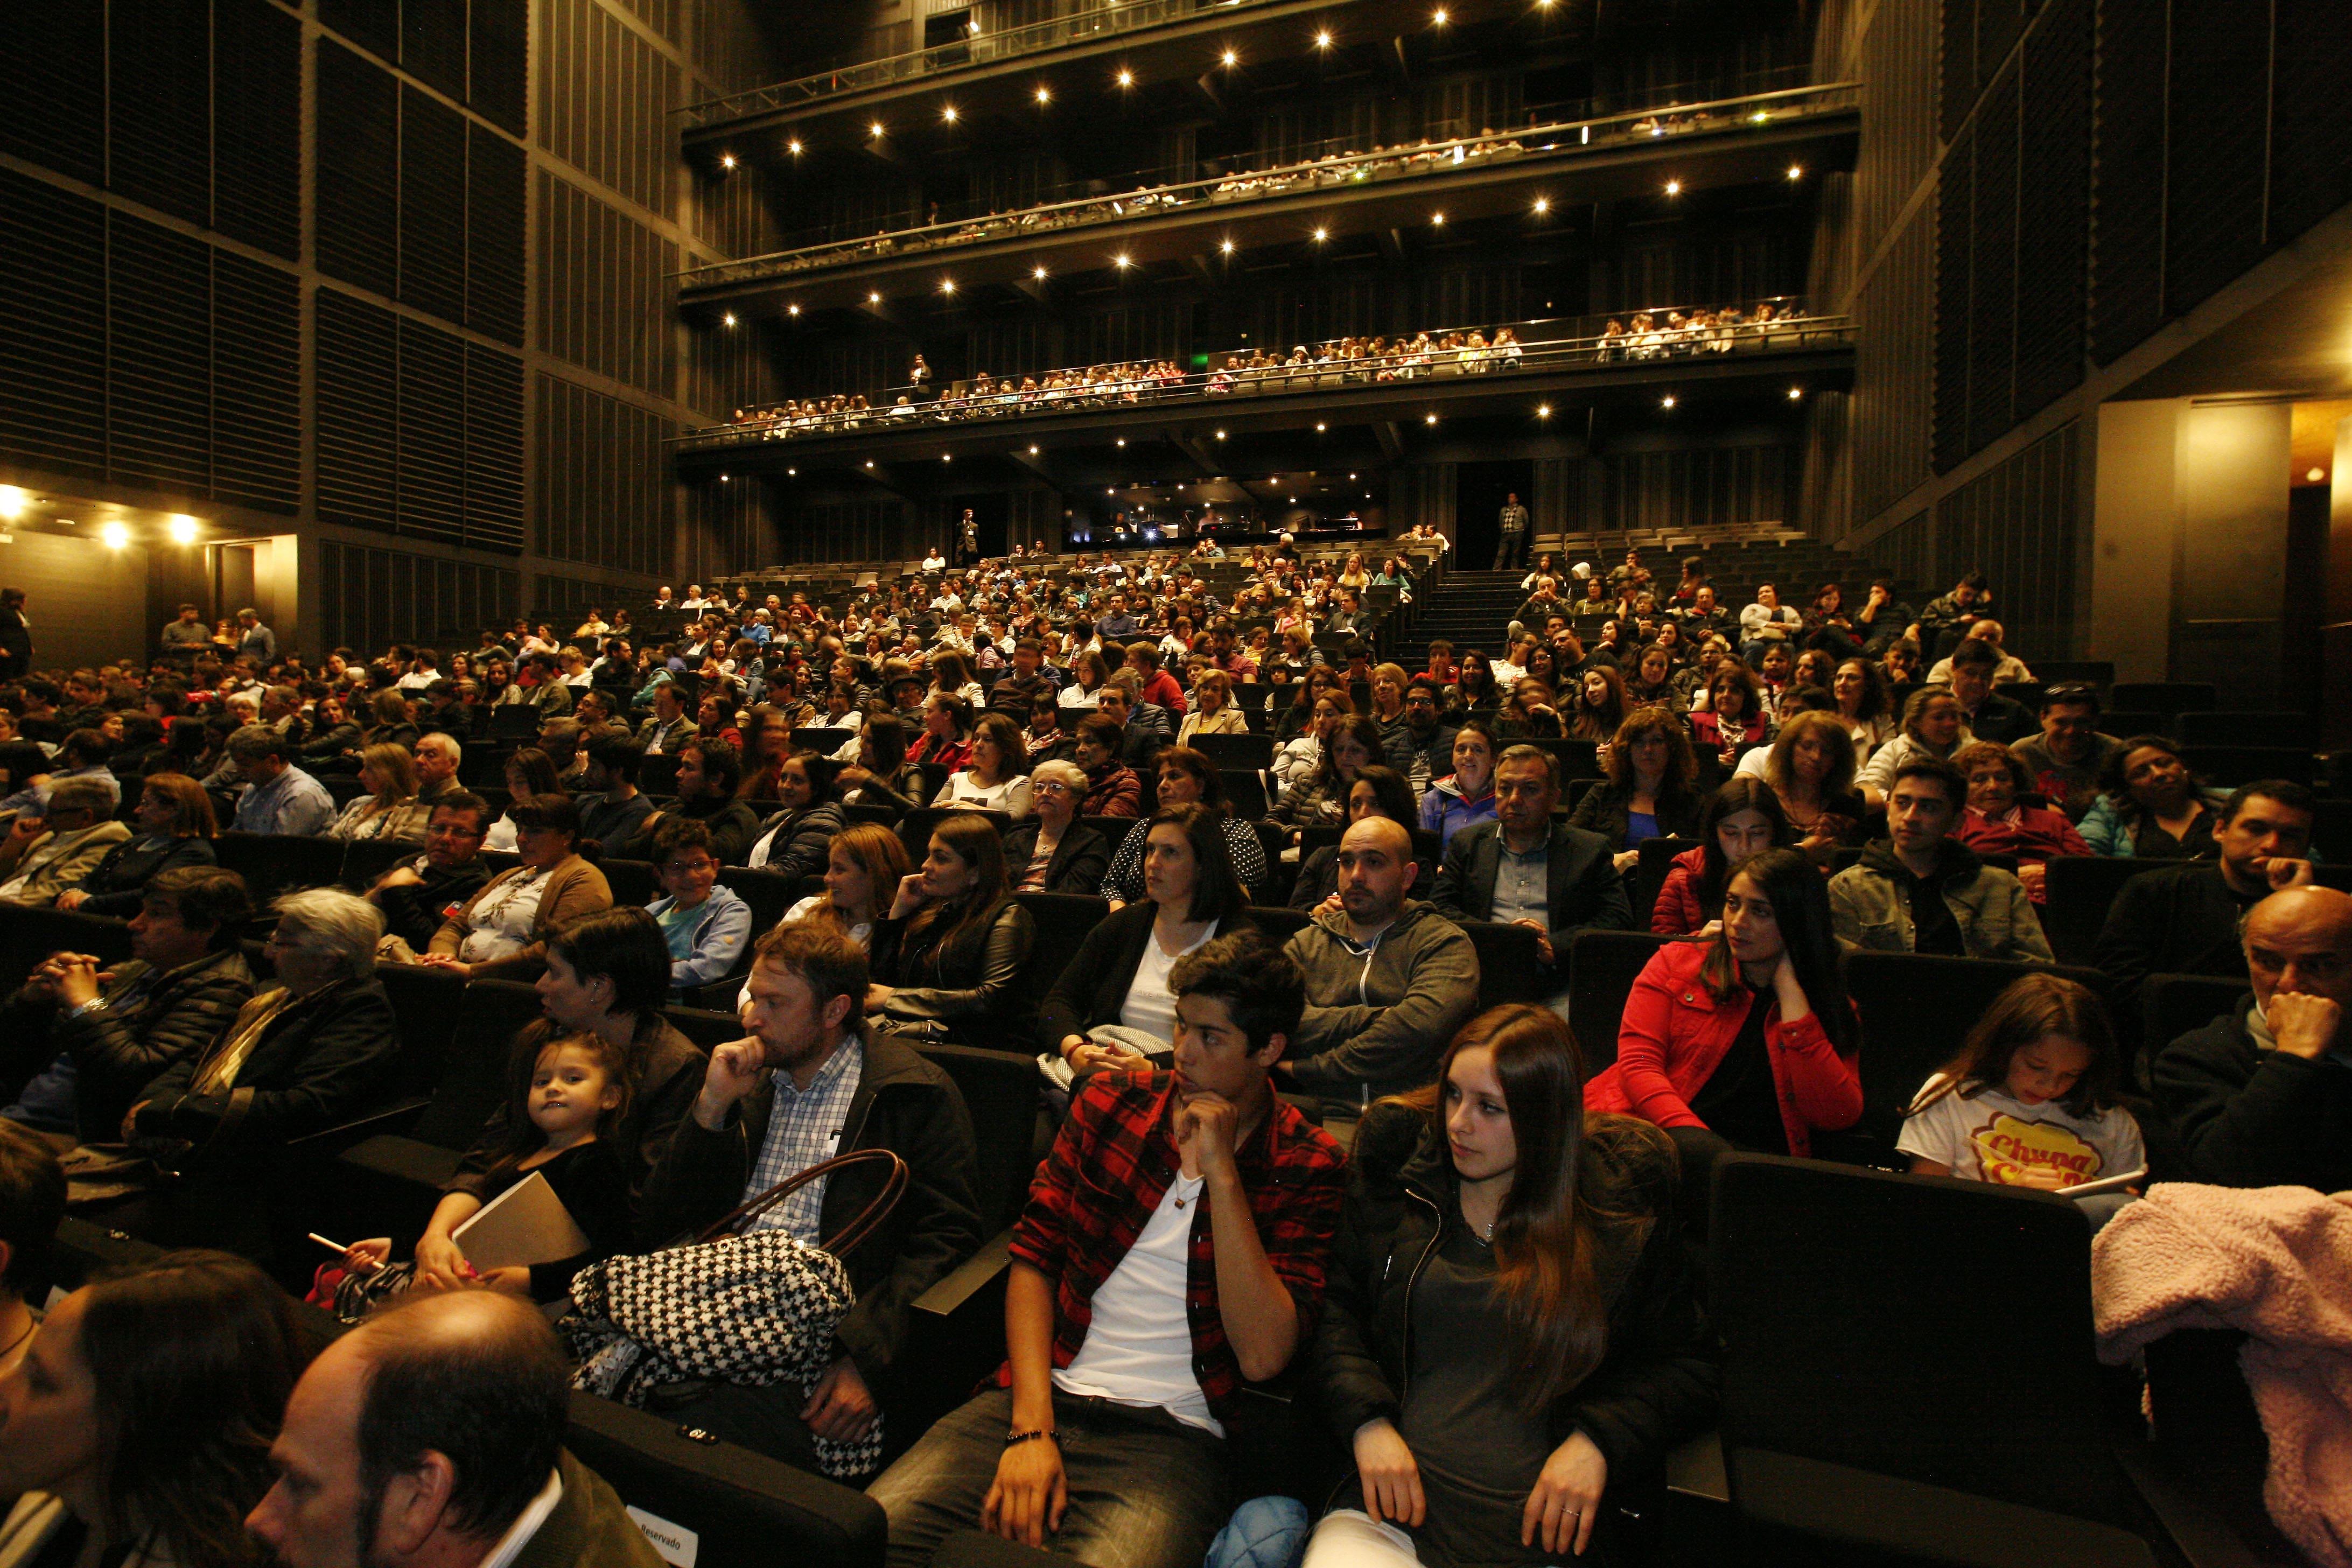 https://www.arauco.cl/chile/wp-content/uploads/sites/14/2018/12/Convenio-Arauco-Teatro-Biobio-4-min.jpg